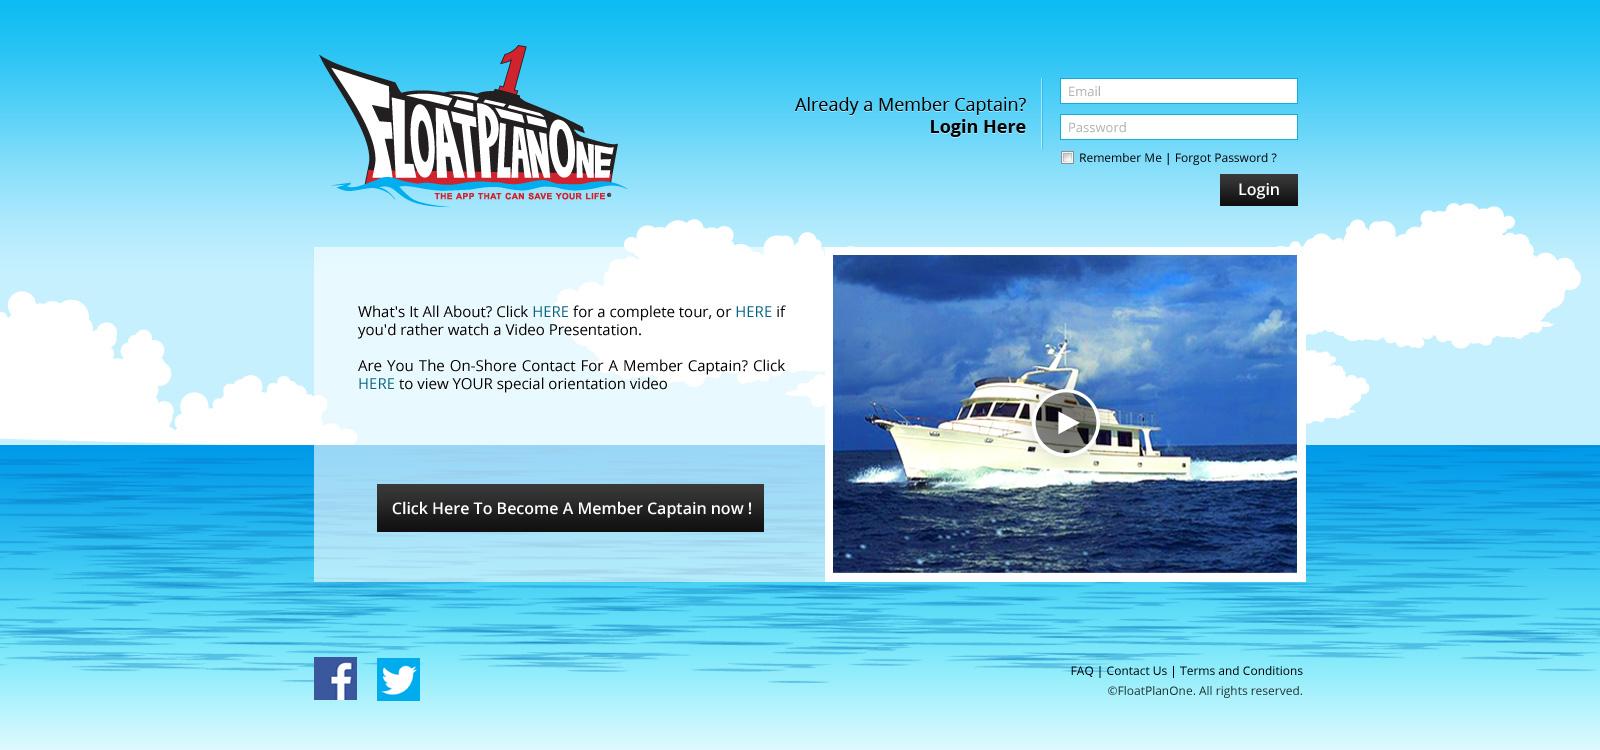 Float Plan One homepage